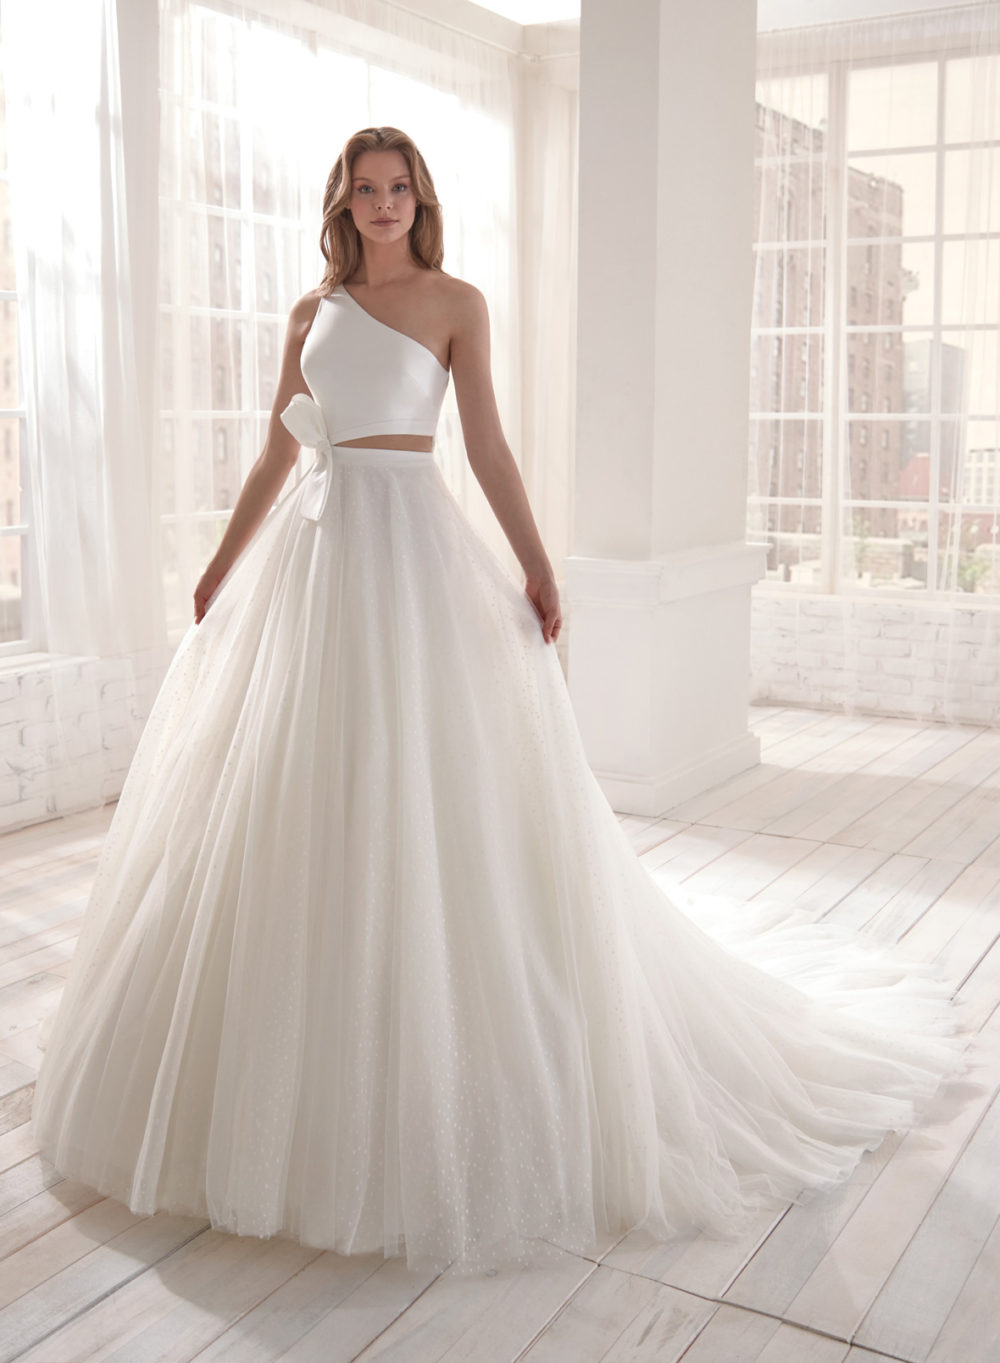 Mariages: abito da sposa Morilee 2020 a Vicenza, Verona, Padova, Veneto JOA20561